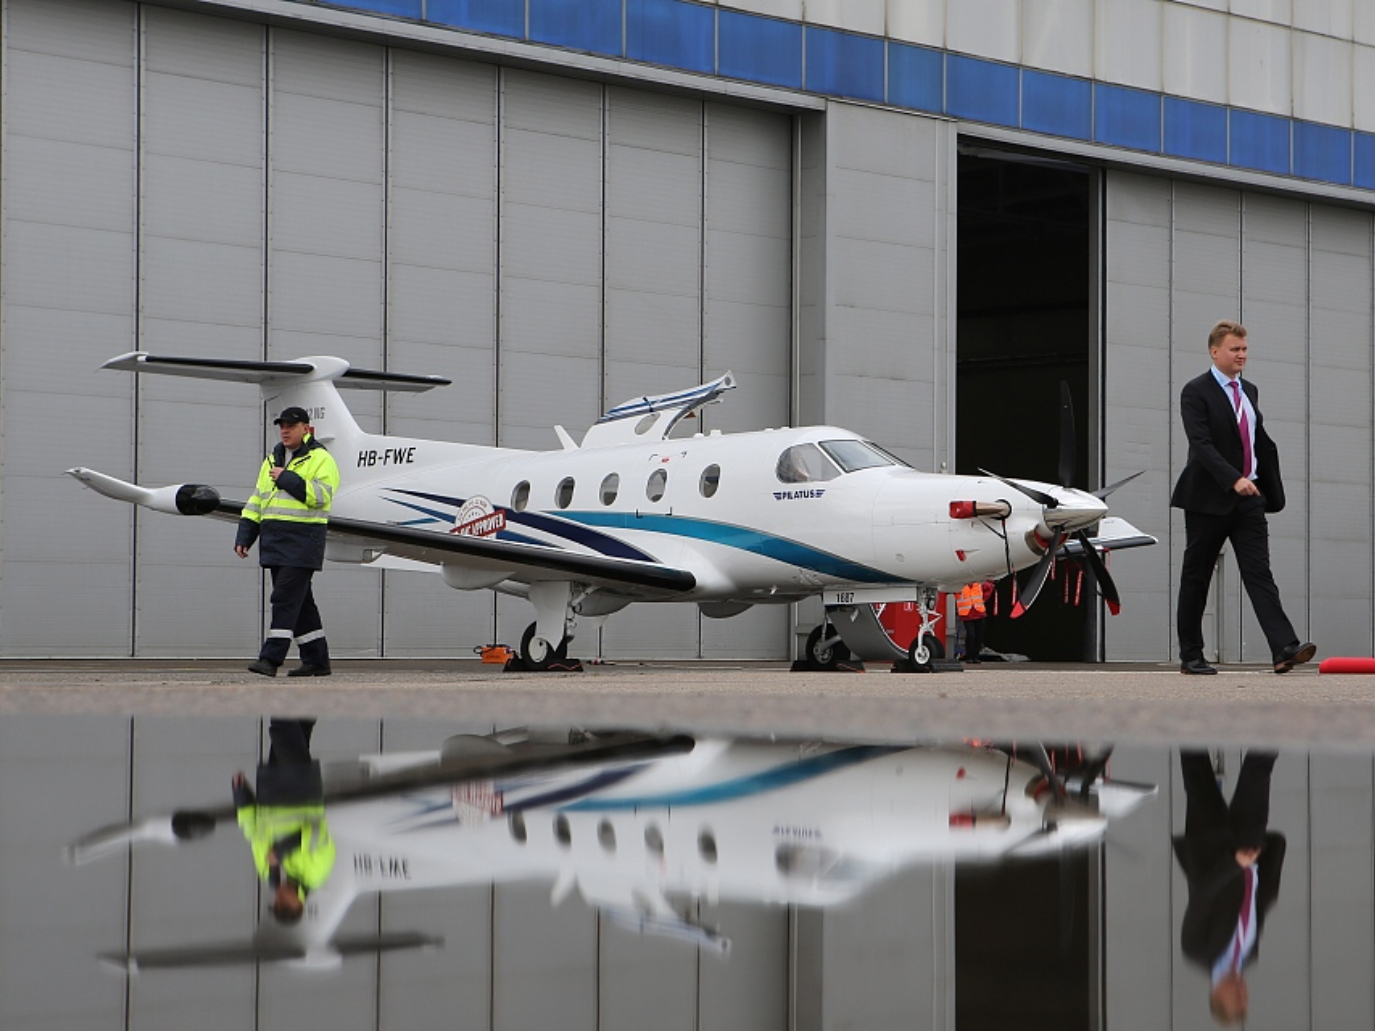 9 people killed in small plane crash in South Dakota, US